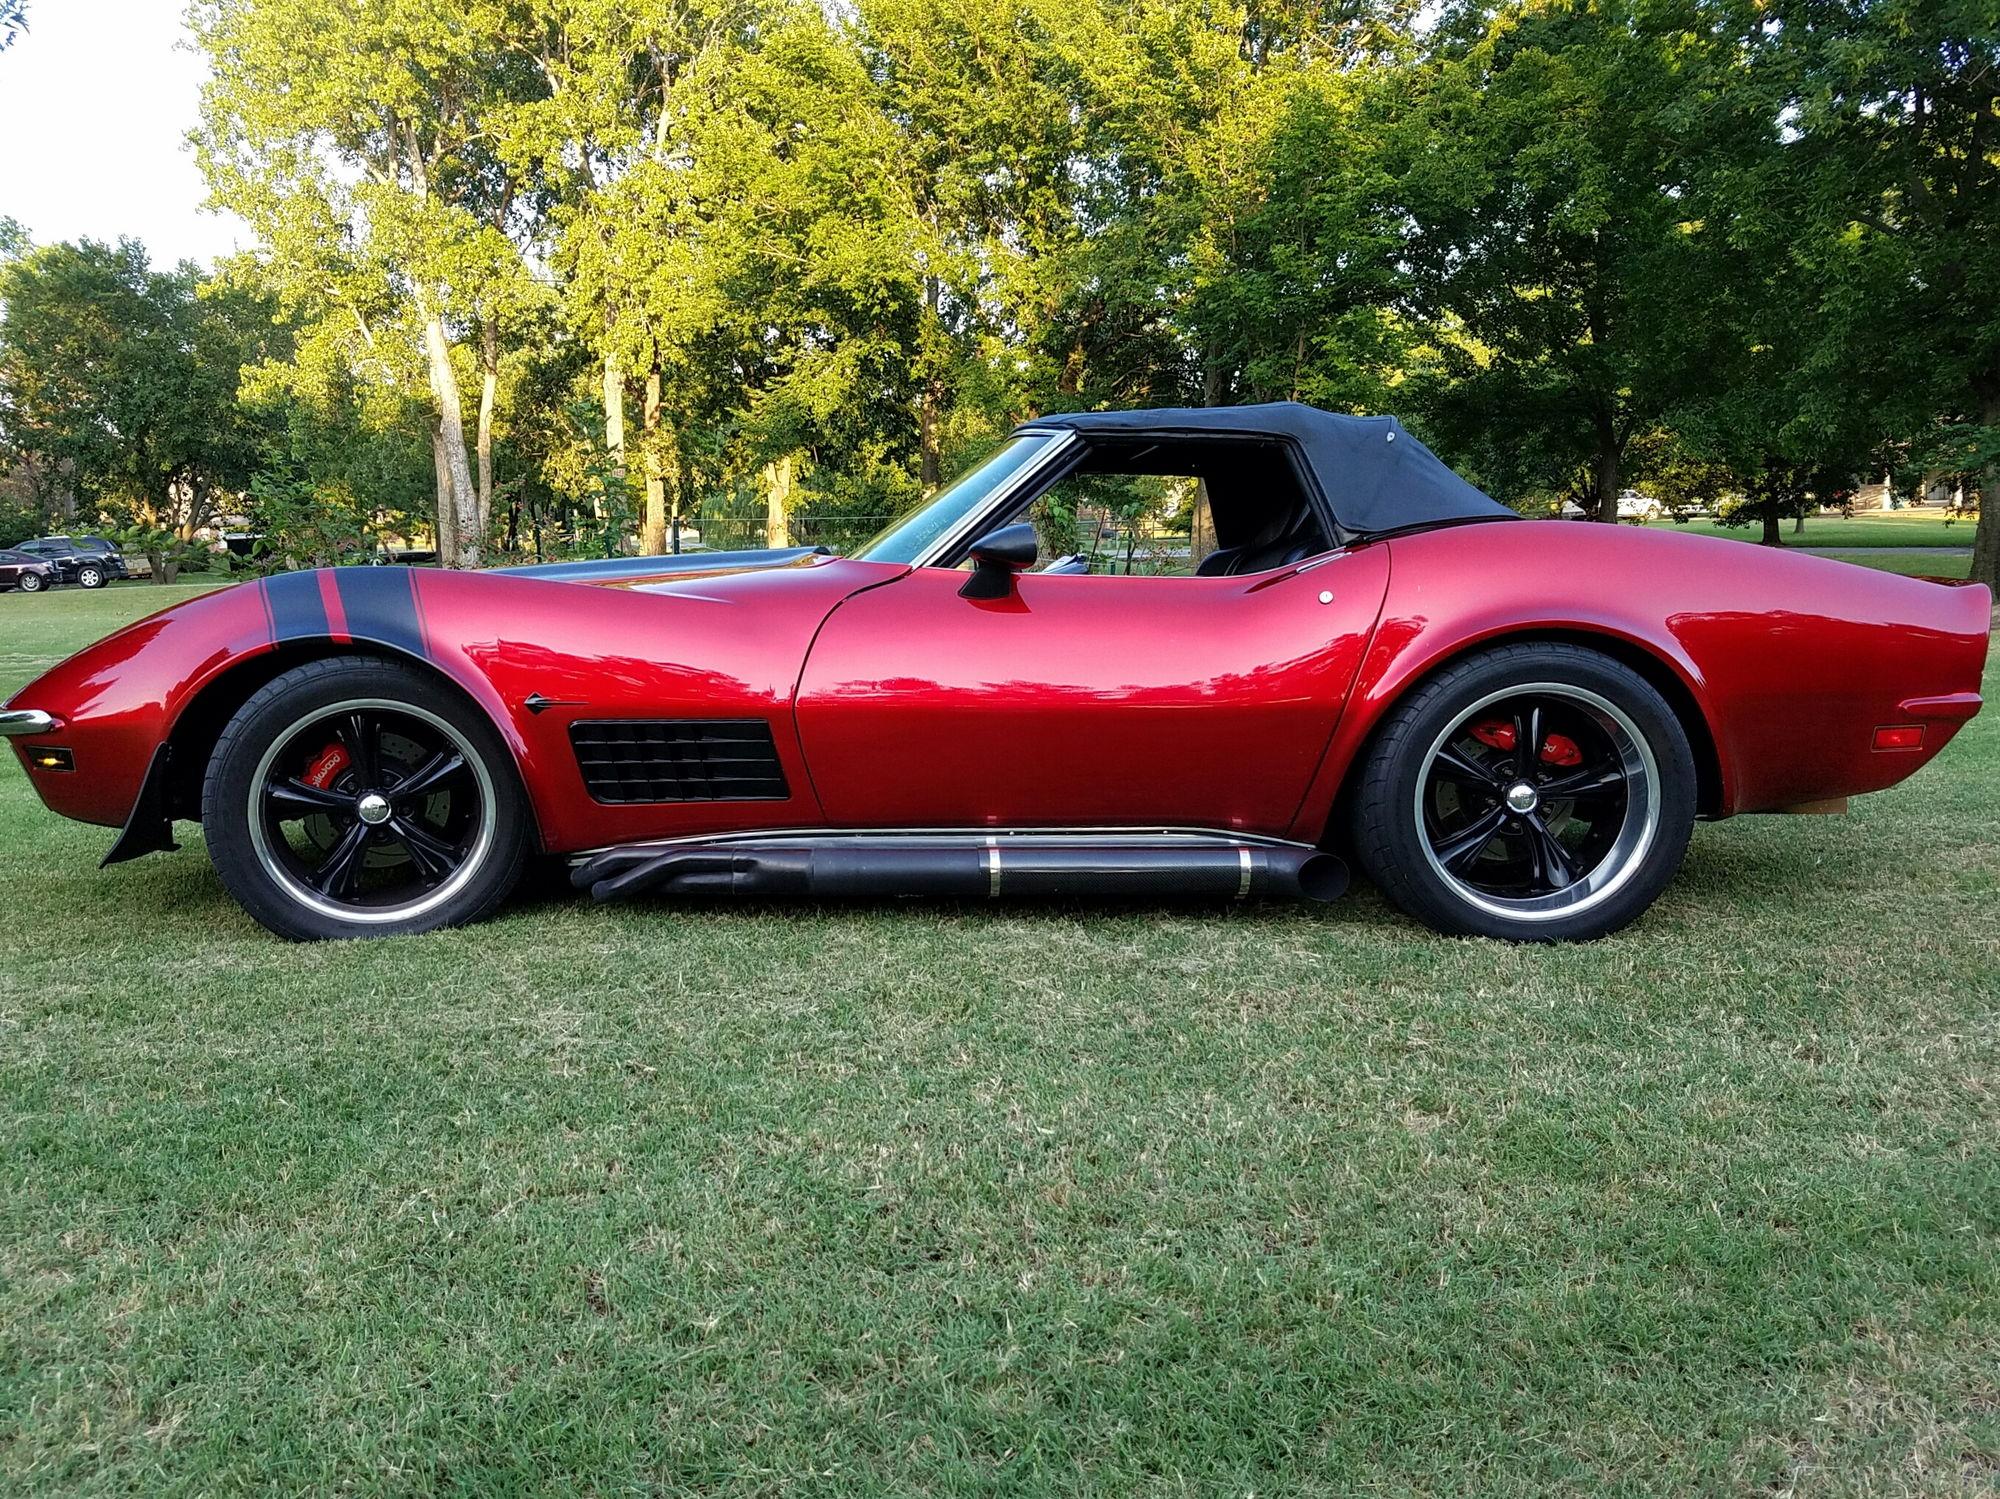 fs for sale 1971 convertible oklahoma 25 000 page 2 corvetteforum chevrolet corvette. Black Bedroom Furniture Sets. Home Design Ideas